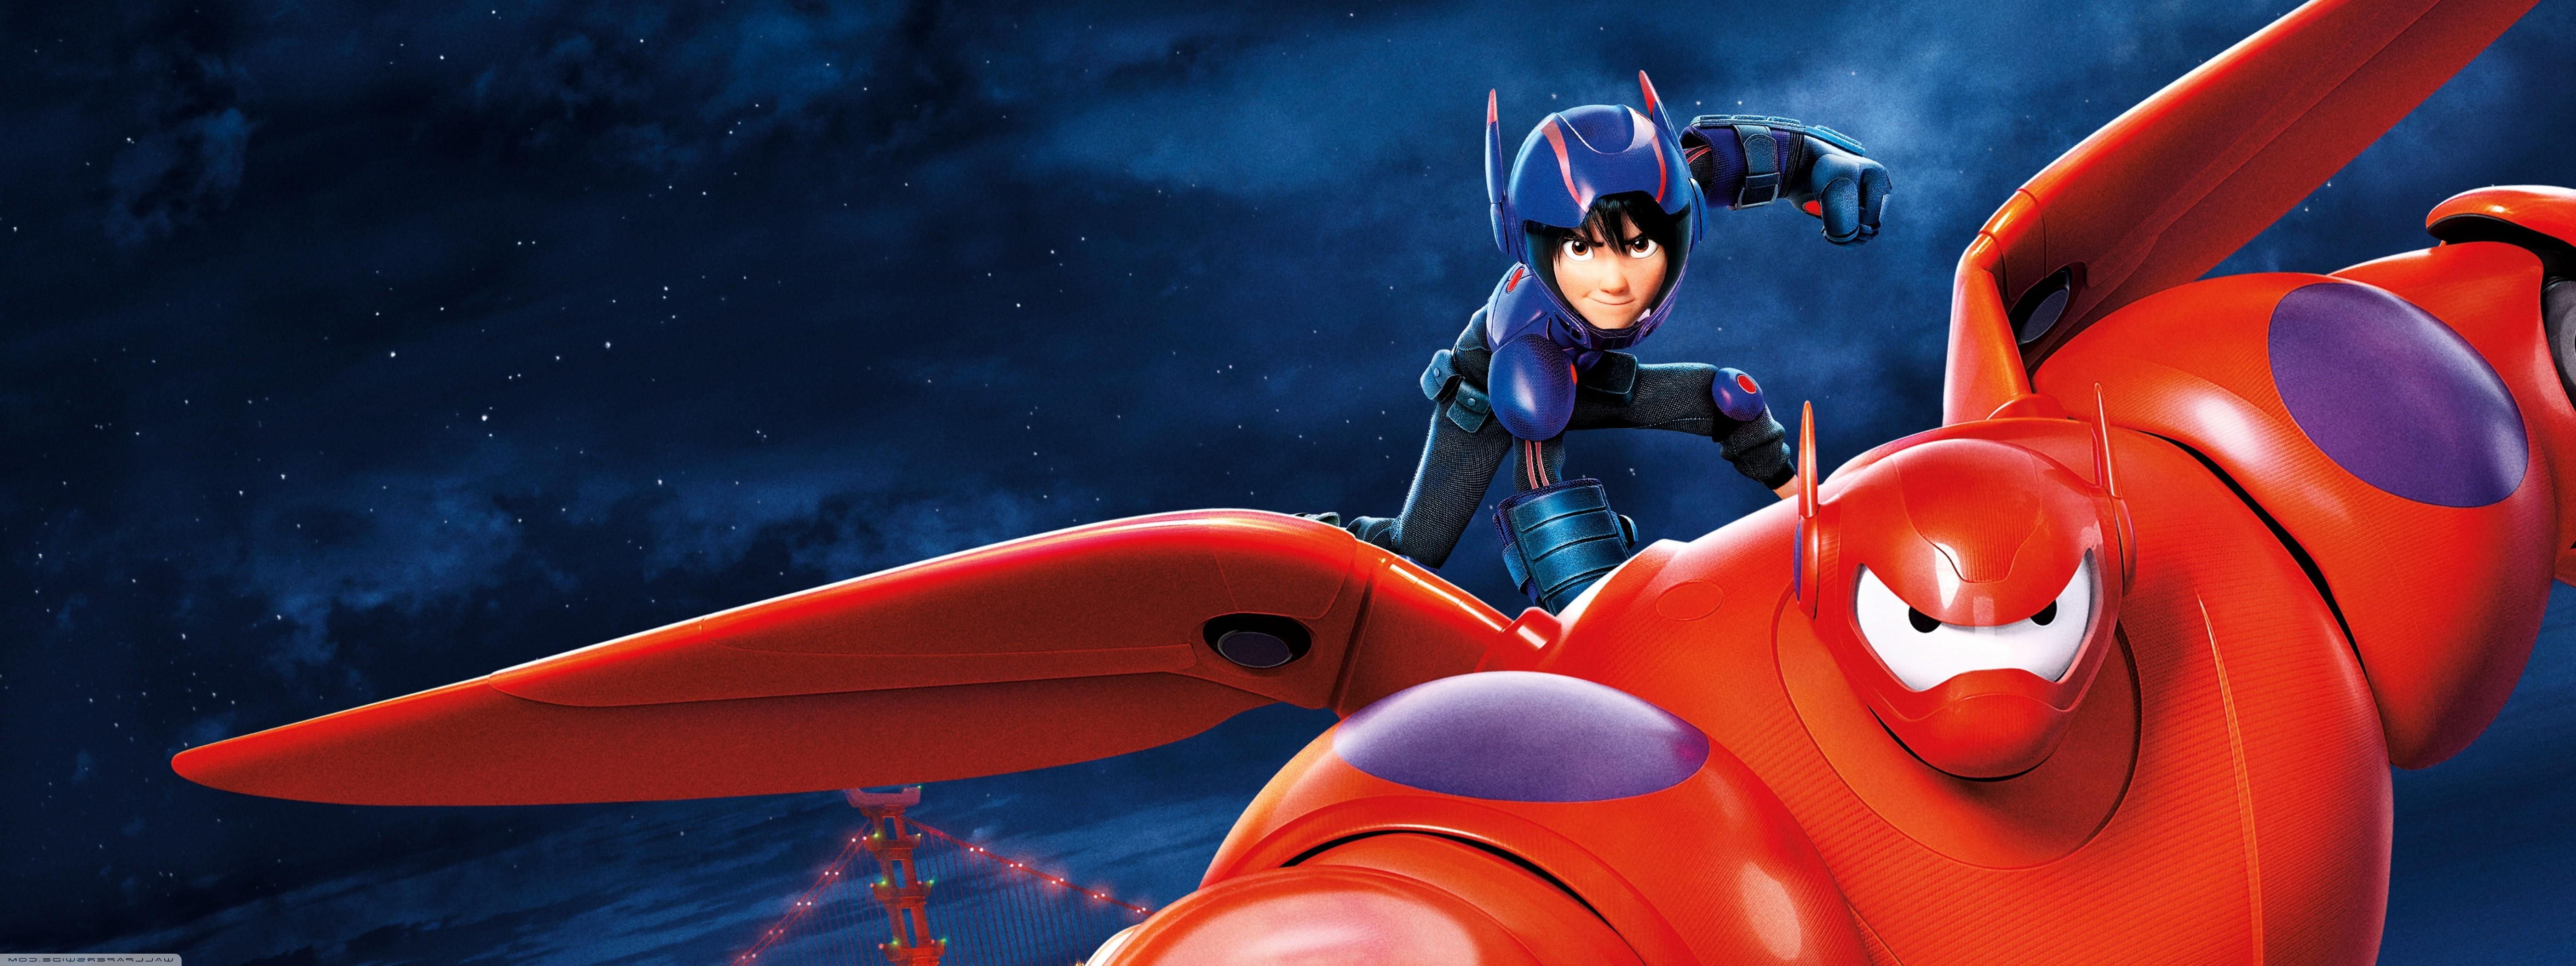 Wallpaper 5600x2100 Px Baymax Big Hero 6 Disney Movies Pixar Animation Studios 5600x2100 Goodfon 1039424 Hd Wallpapers Wallhere